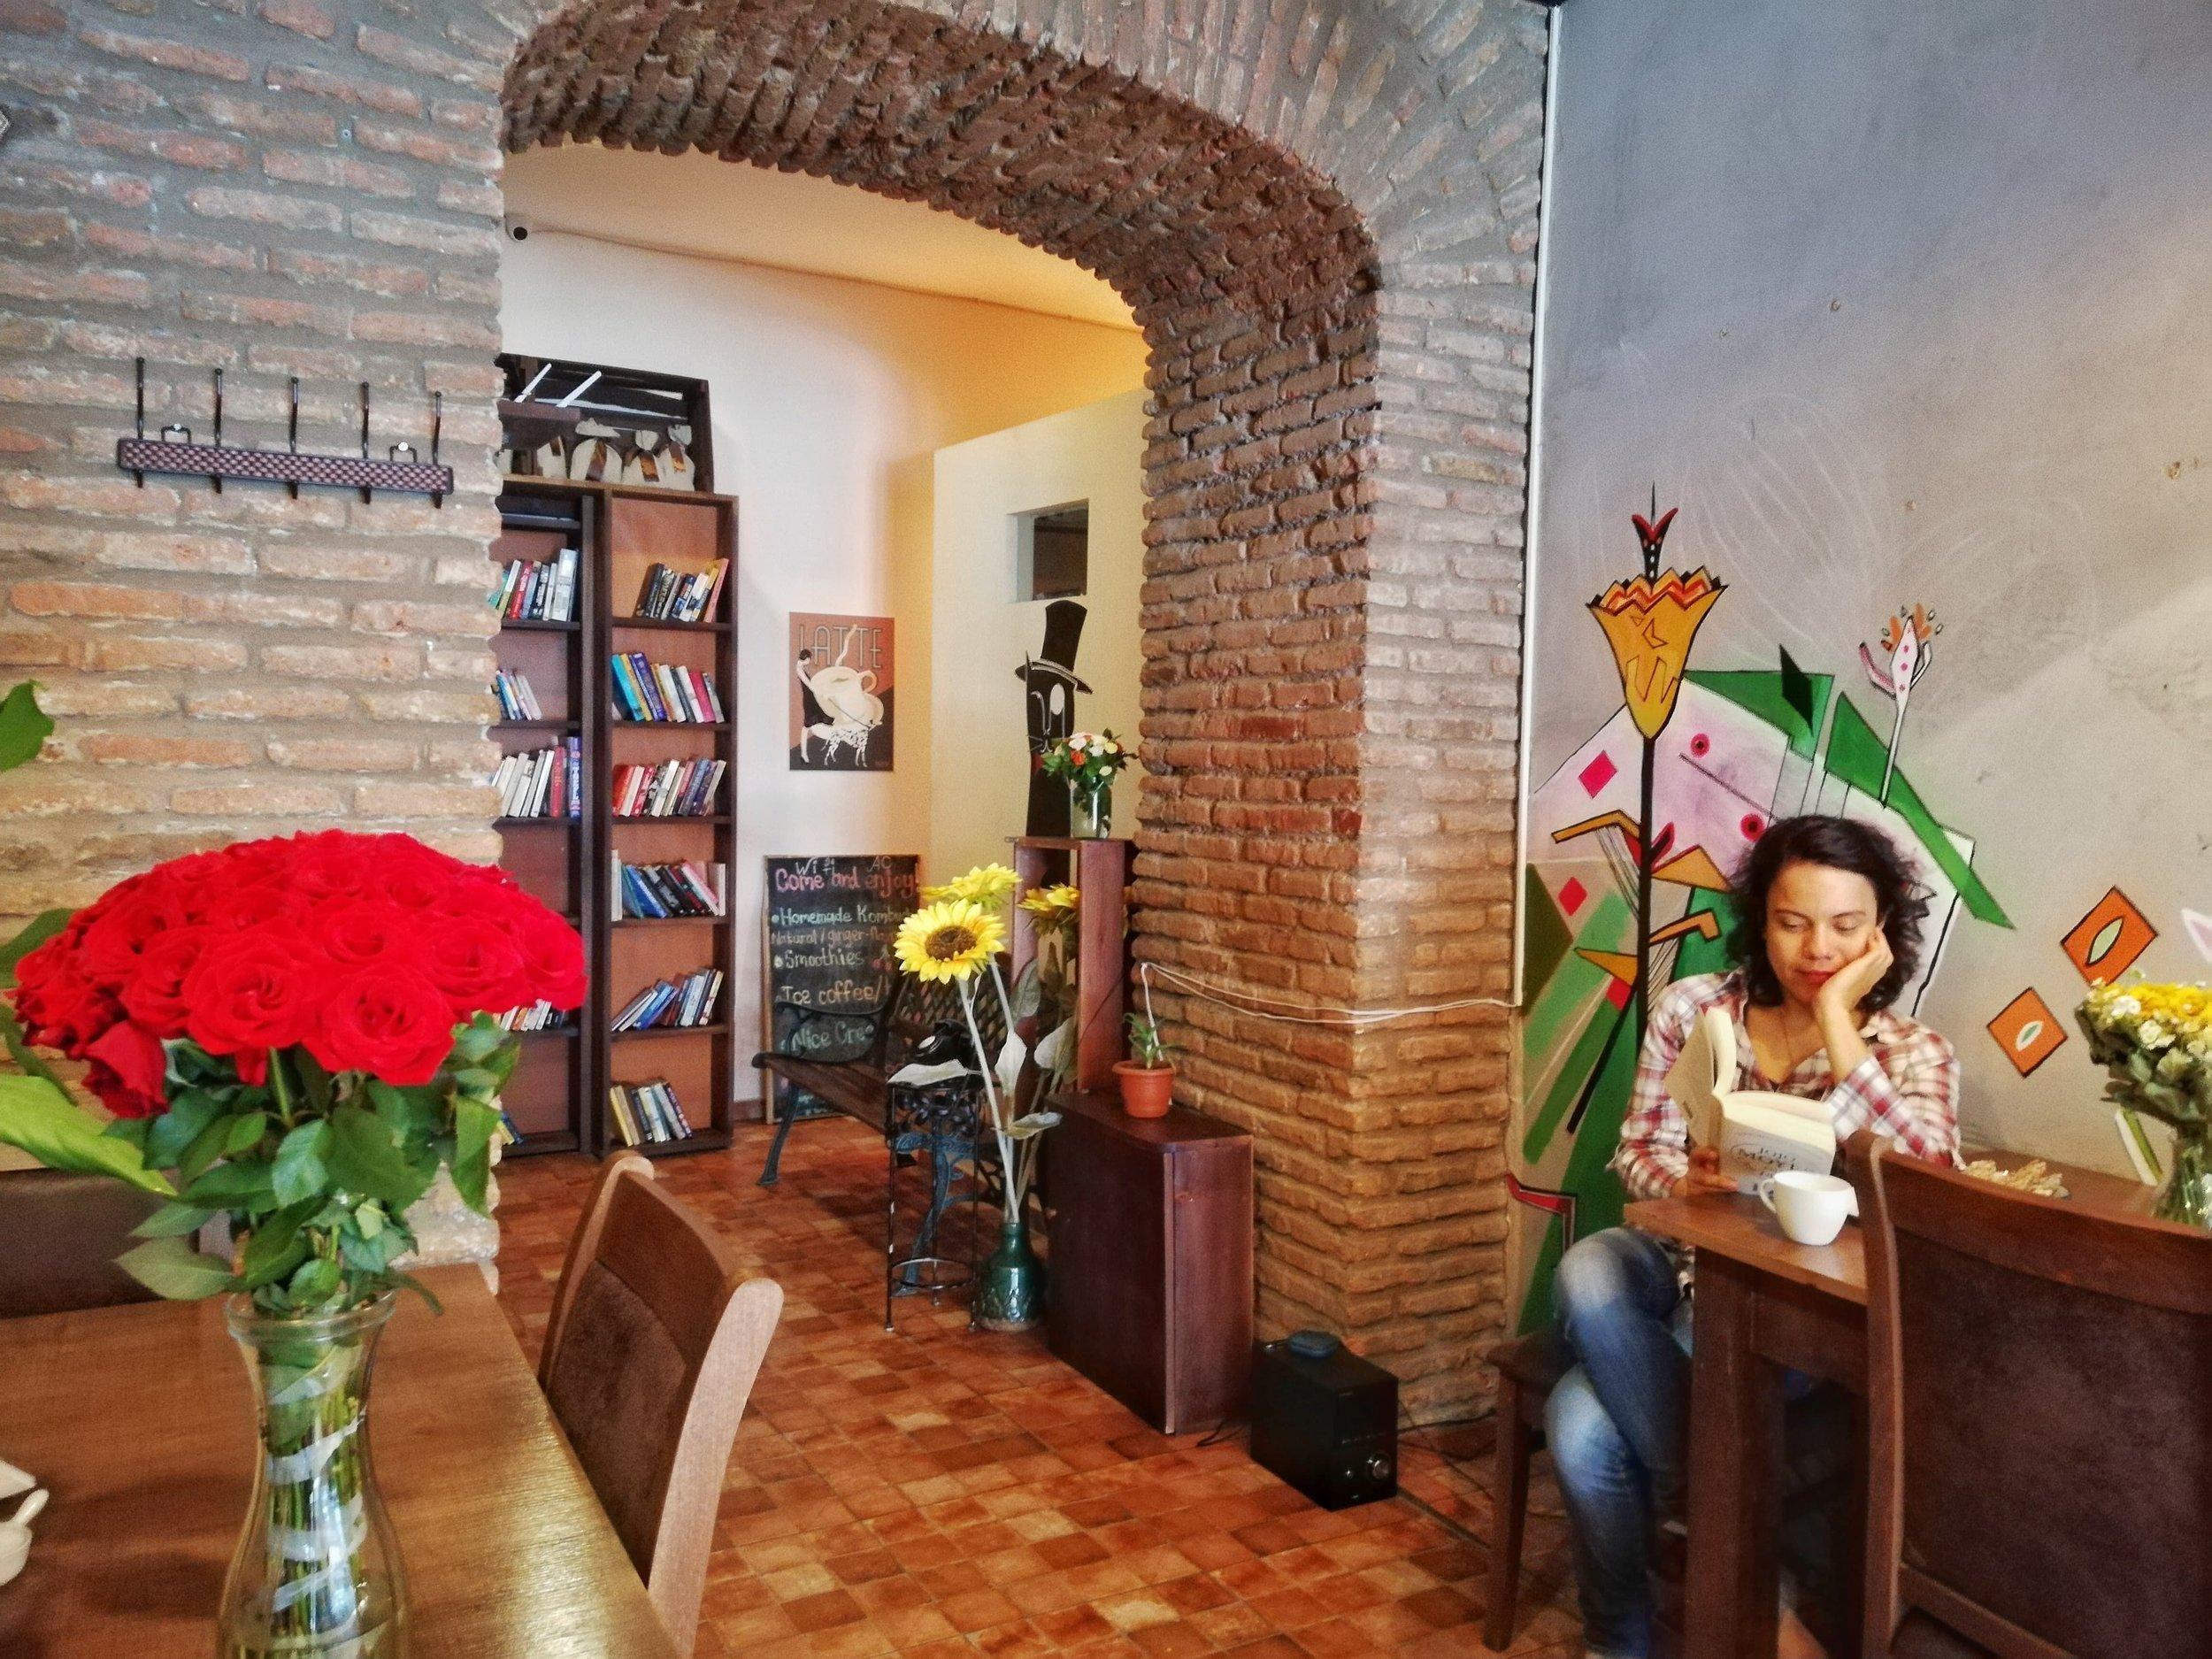 Mama terra cafe tbilisi georgi is a must visit!